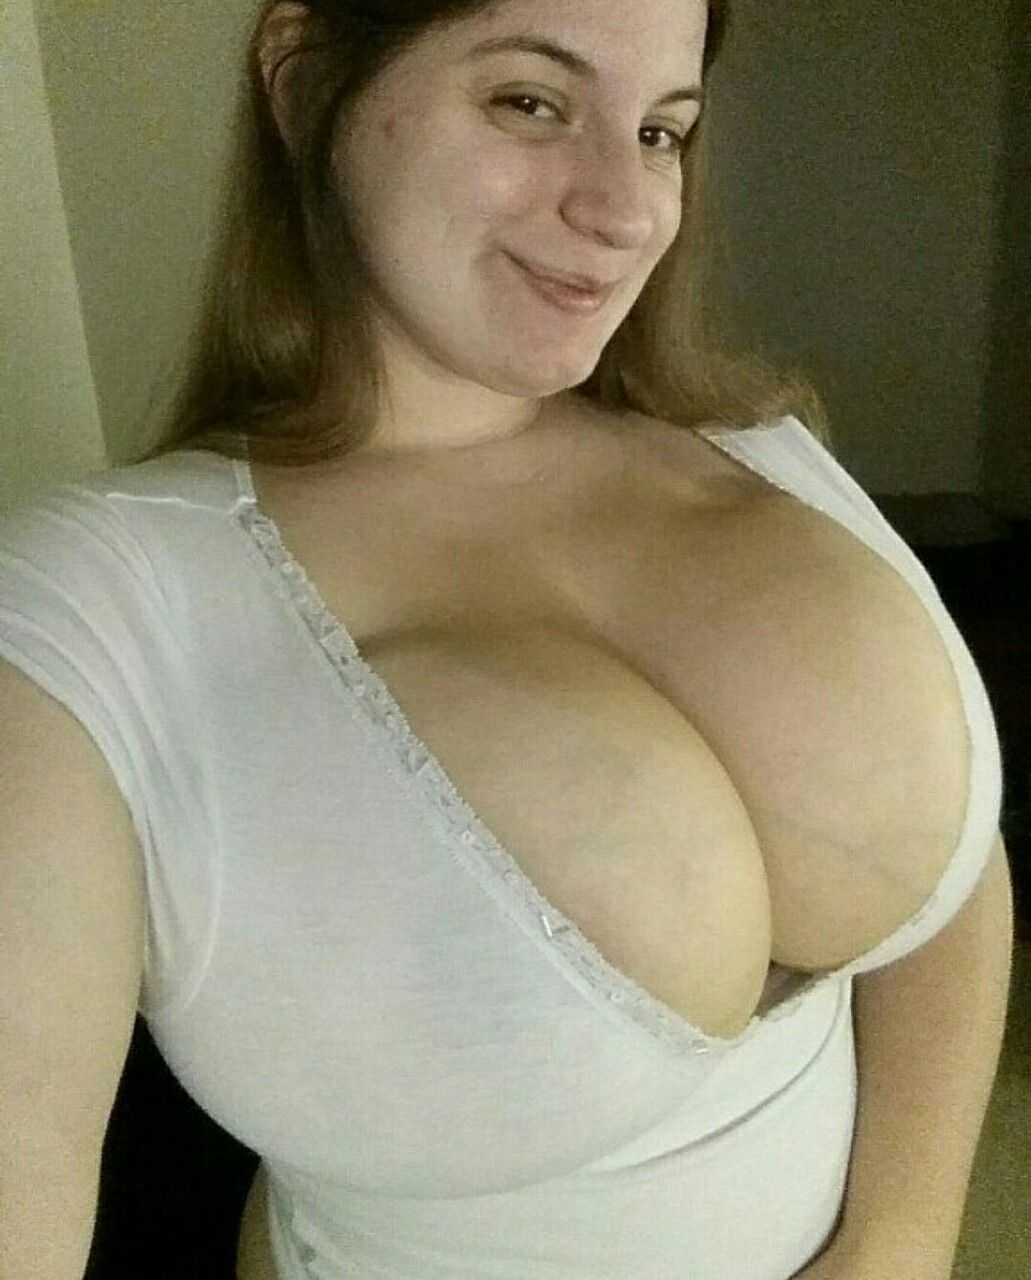 Best squirter in porn-8921